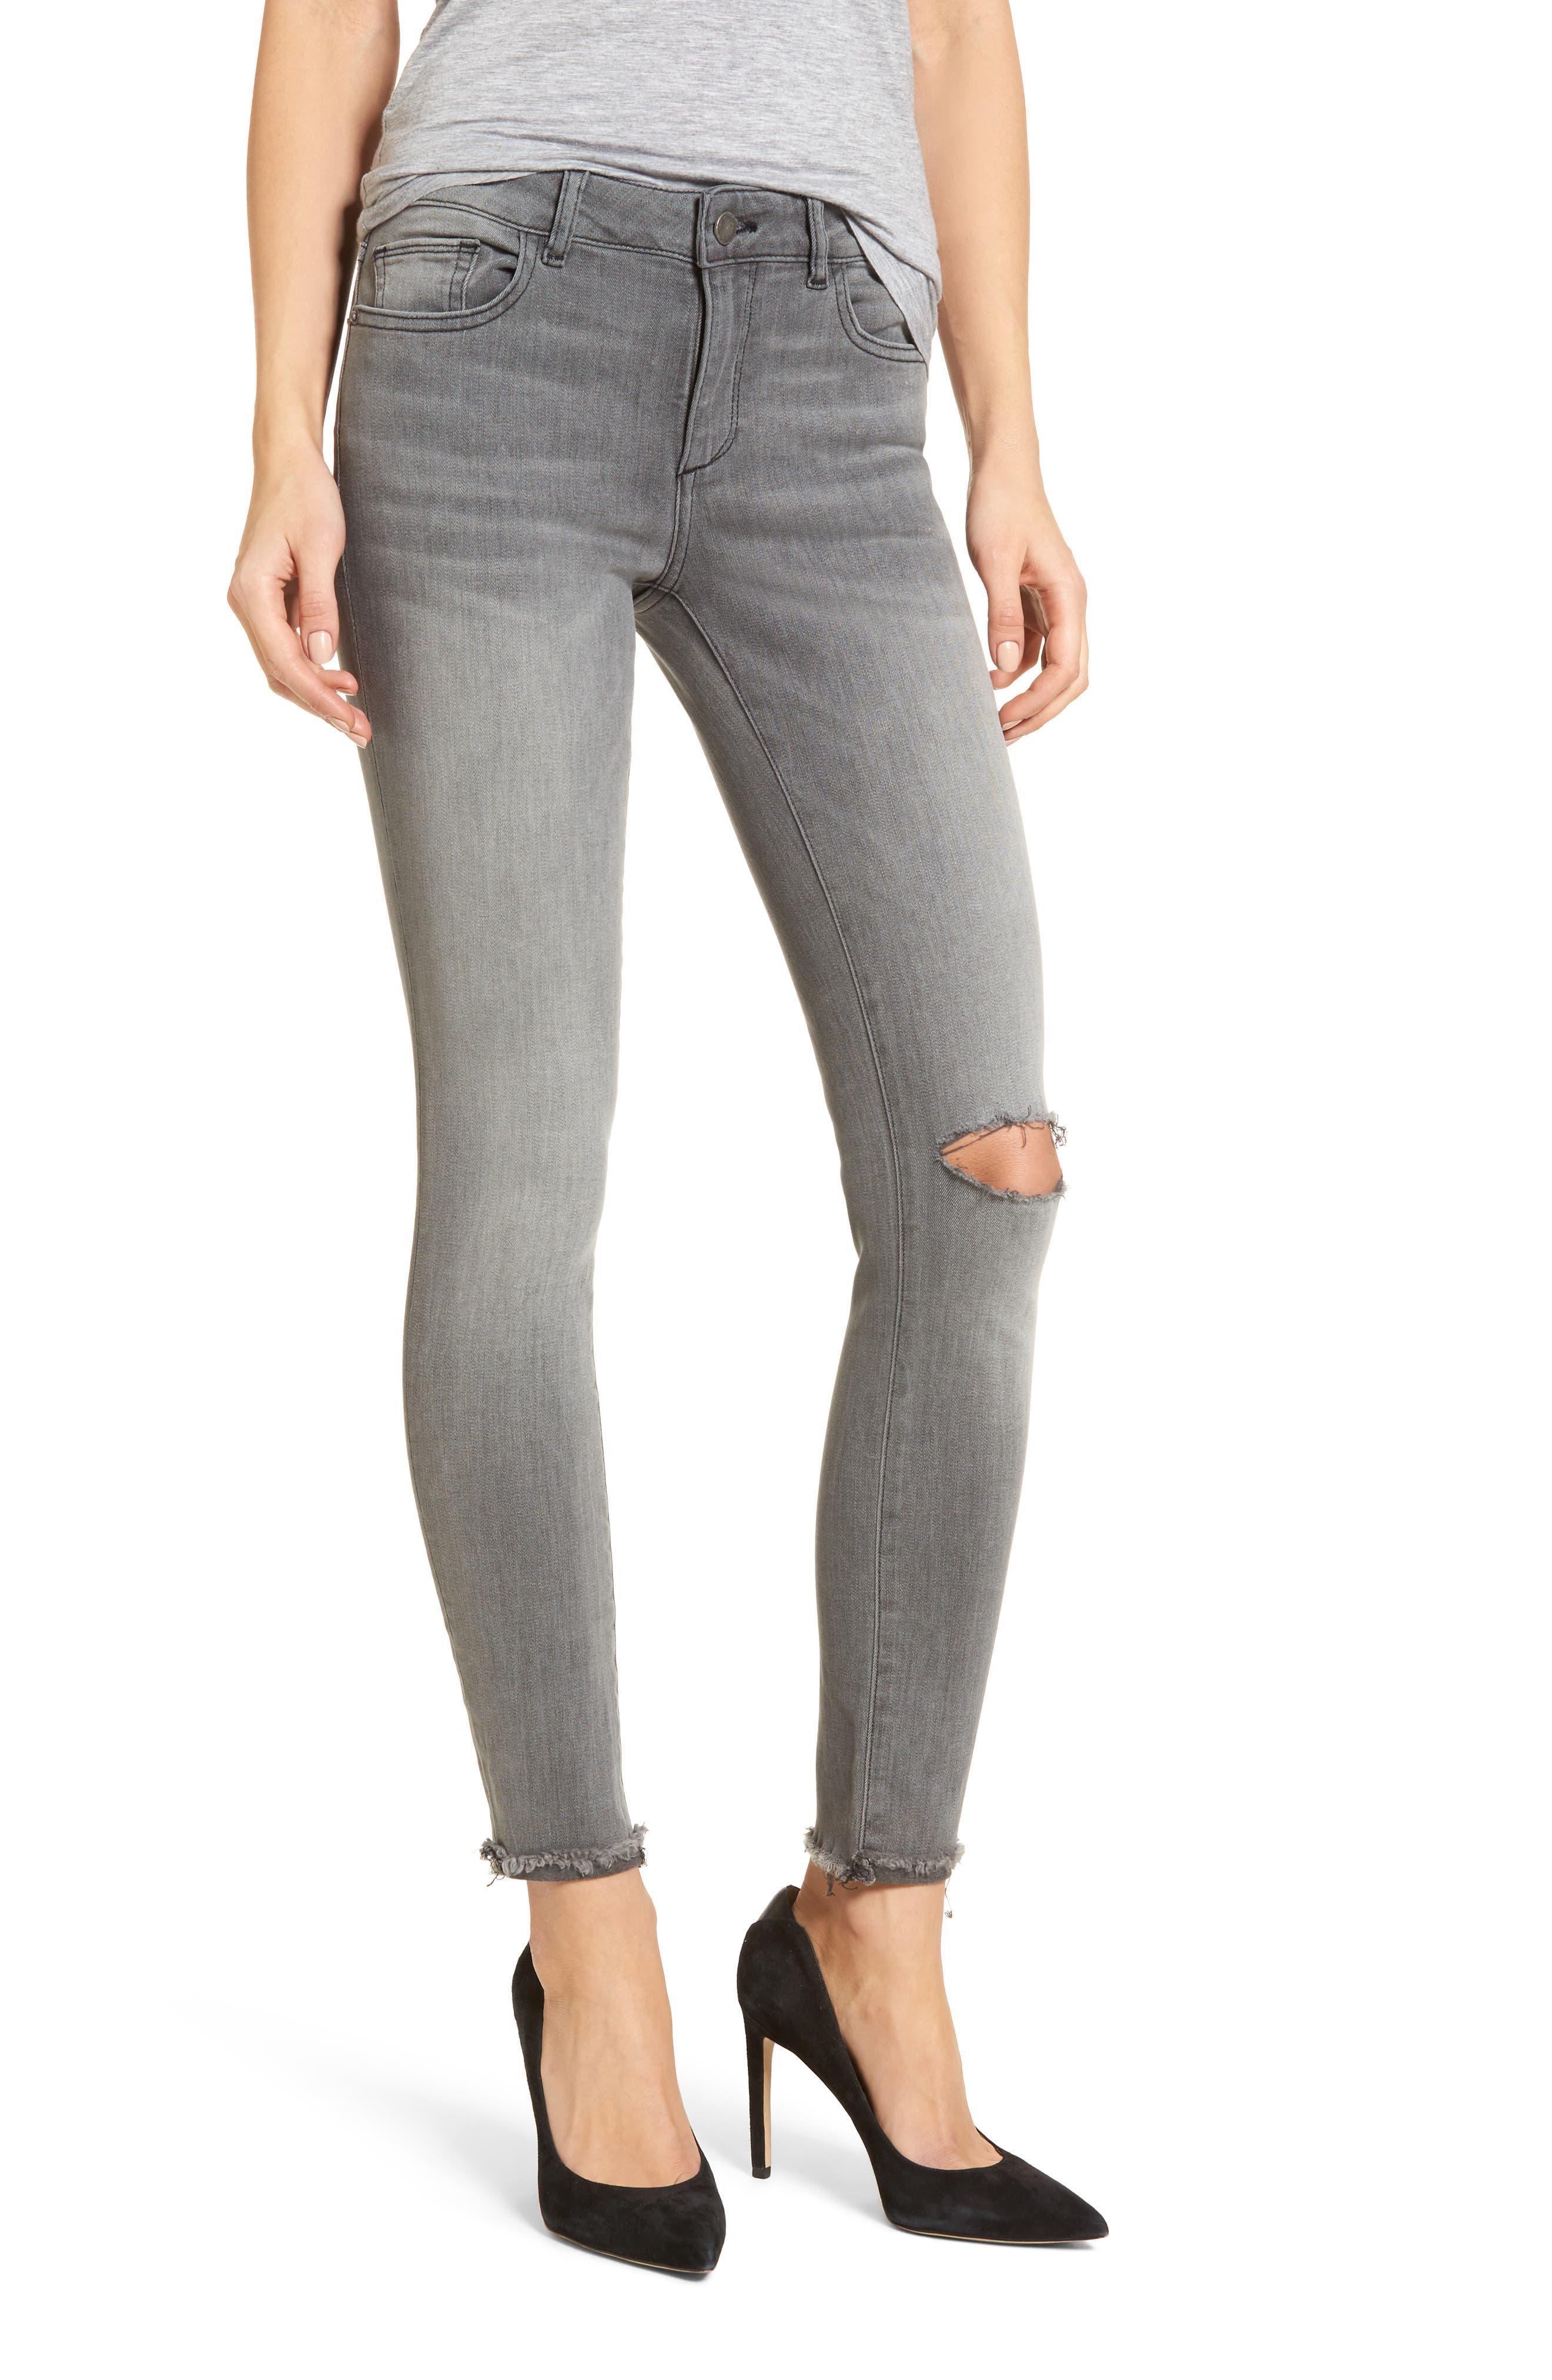 DL1961 Emma Power Legging Jeans (Tarrant)